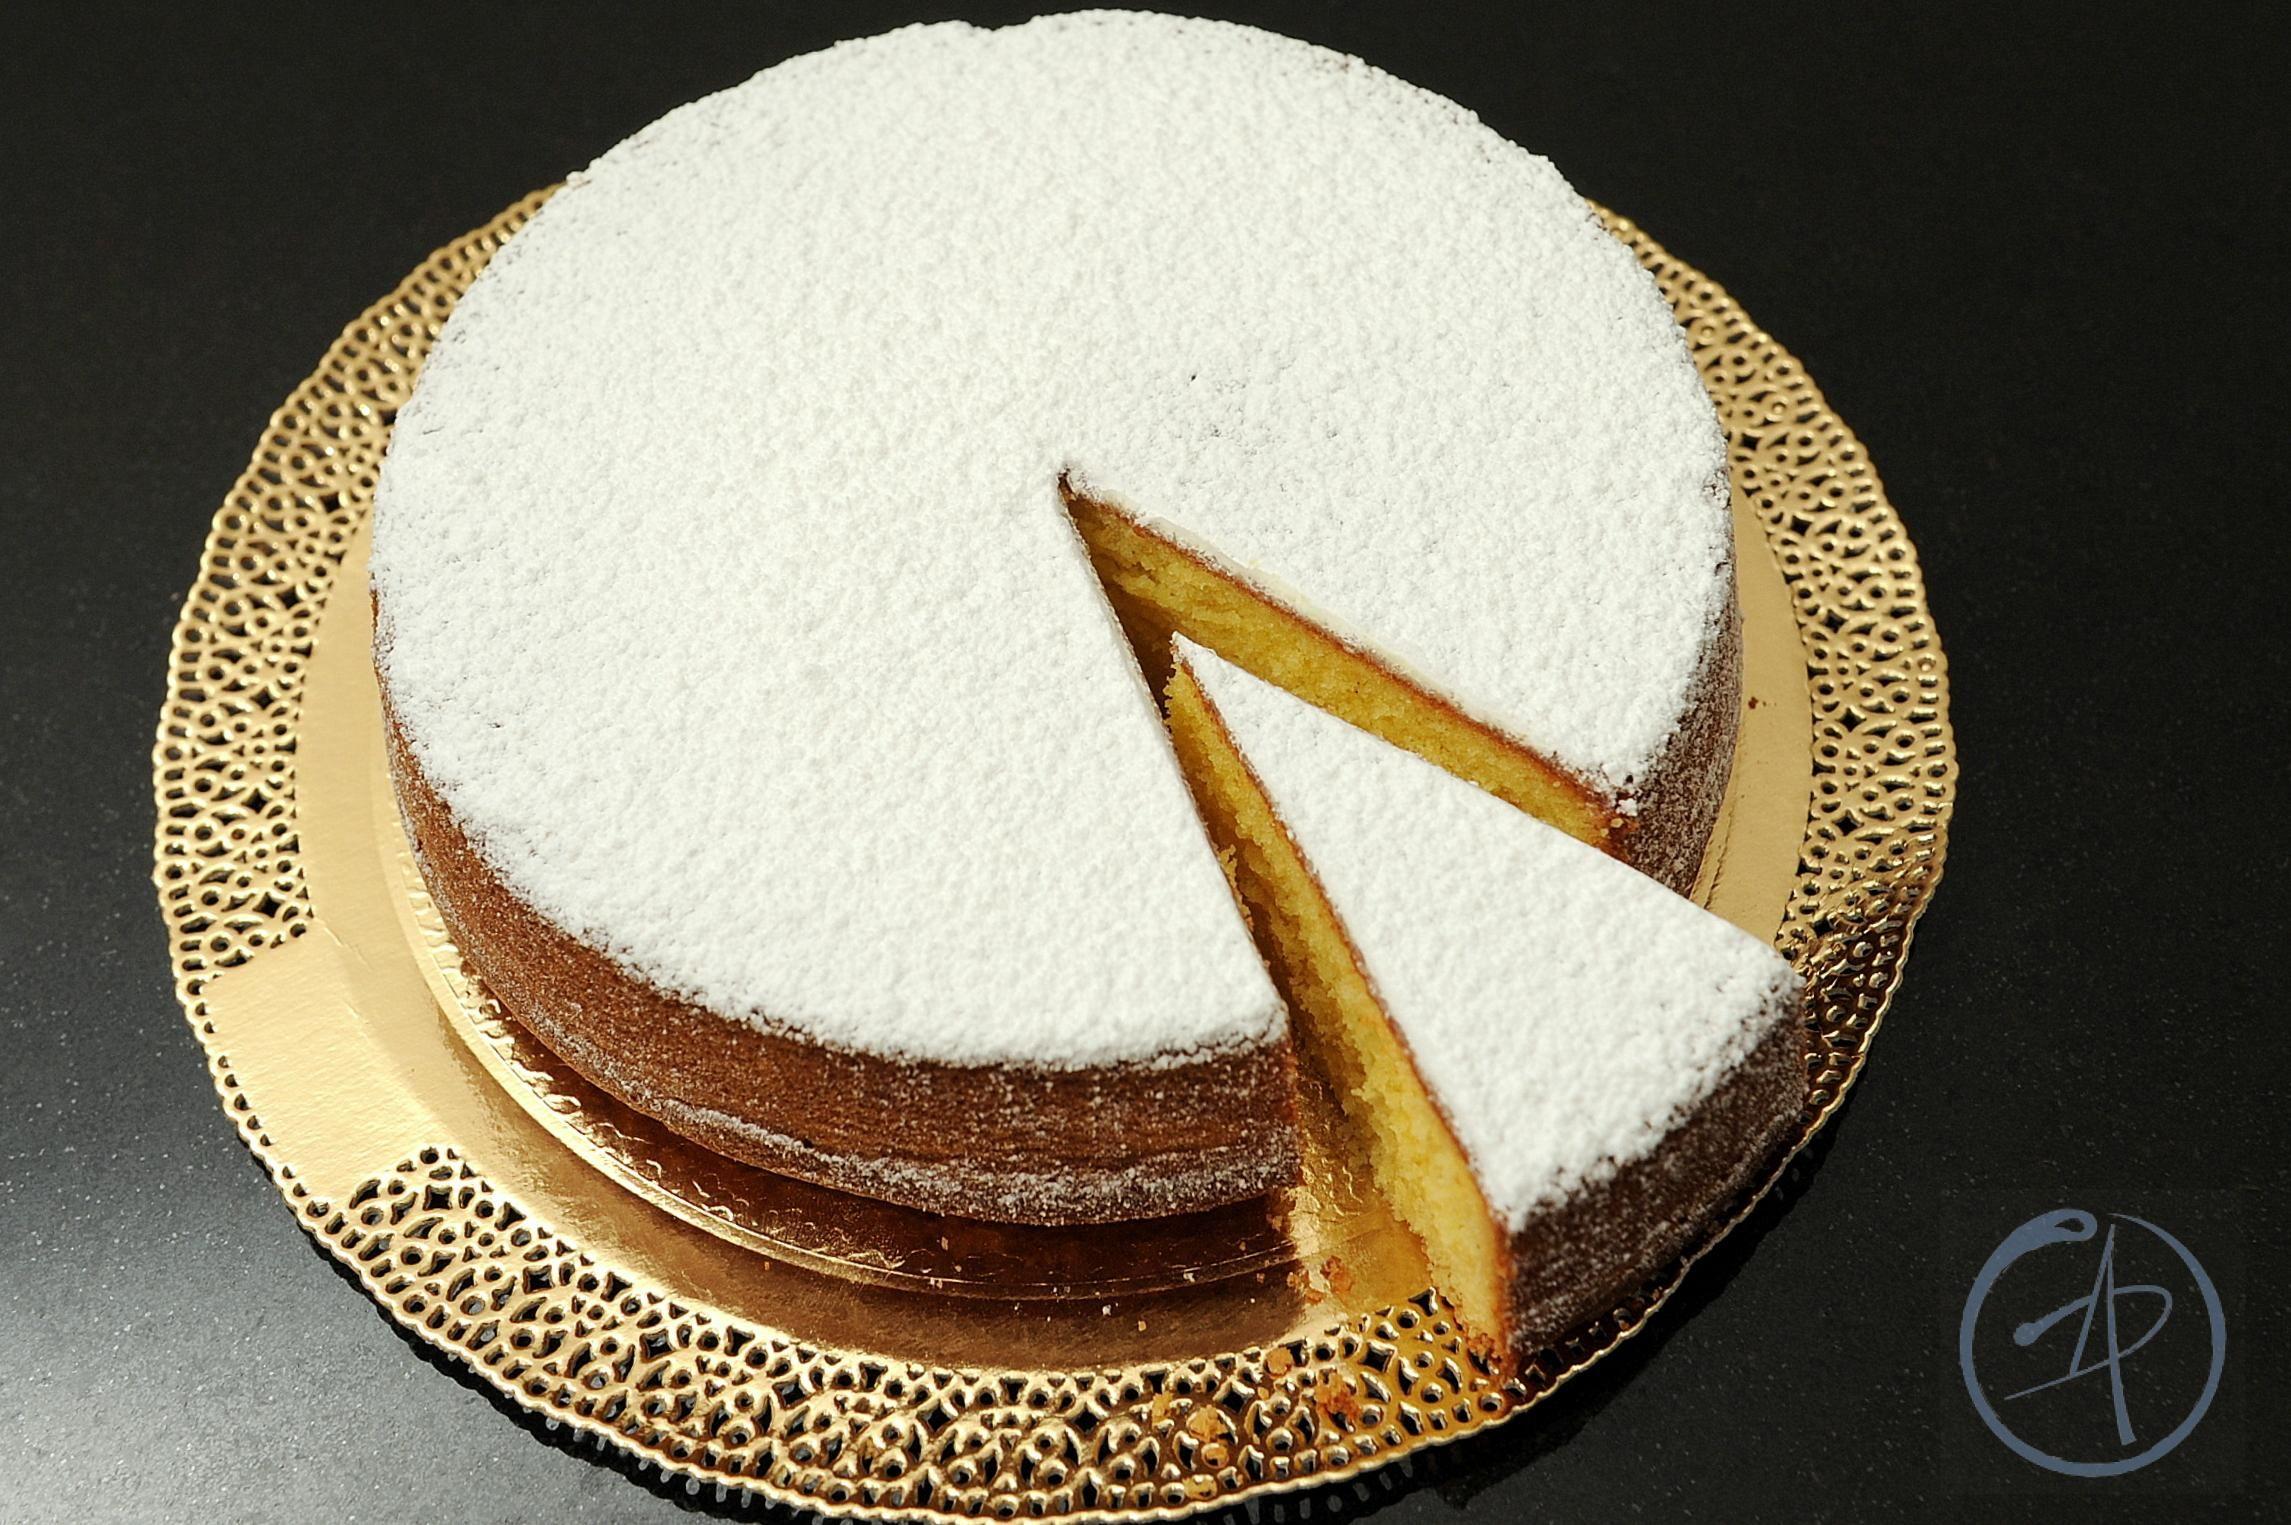 Dolci Da Credenza Torta Paradiso : Ricetta torta paradiso i massari ricette torte da forno